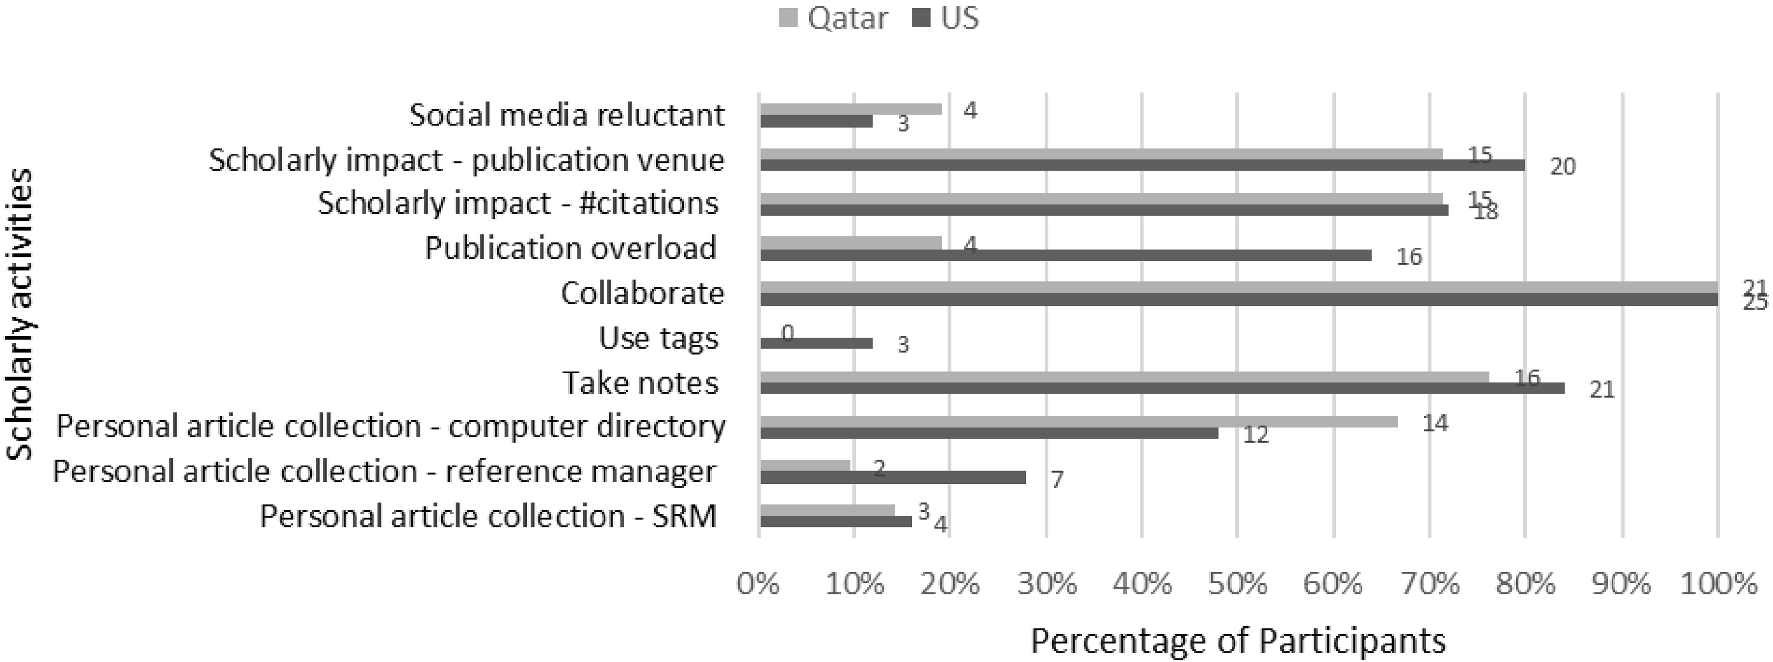 Anatomy of scholarly information behavior patterns in the